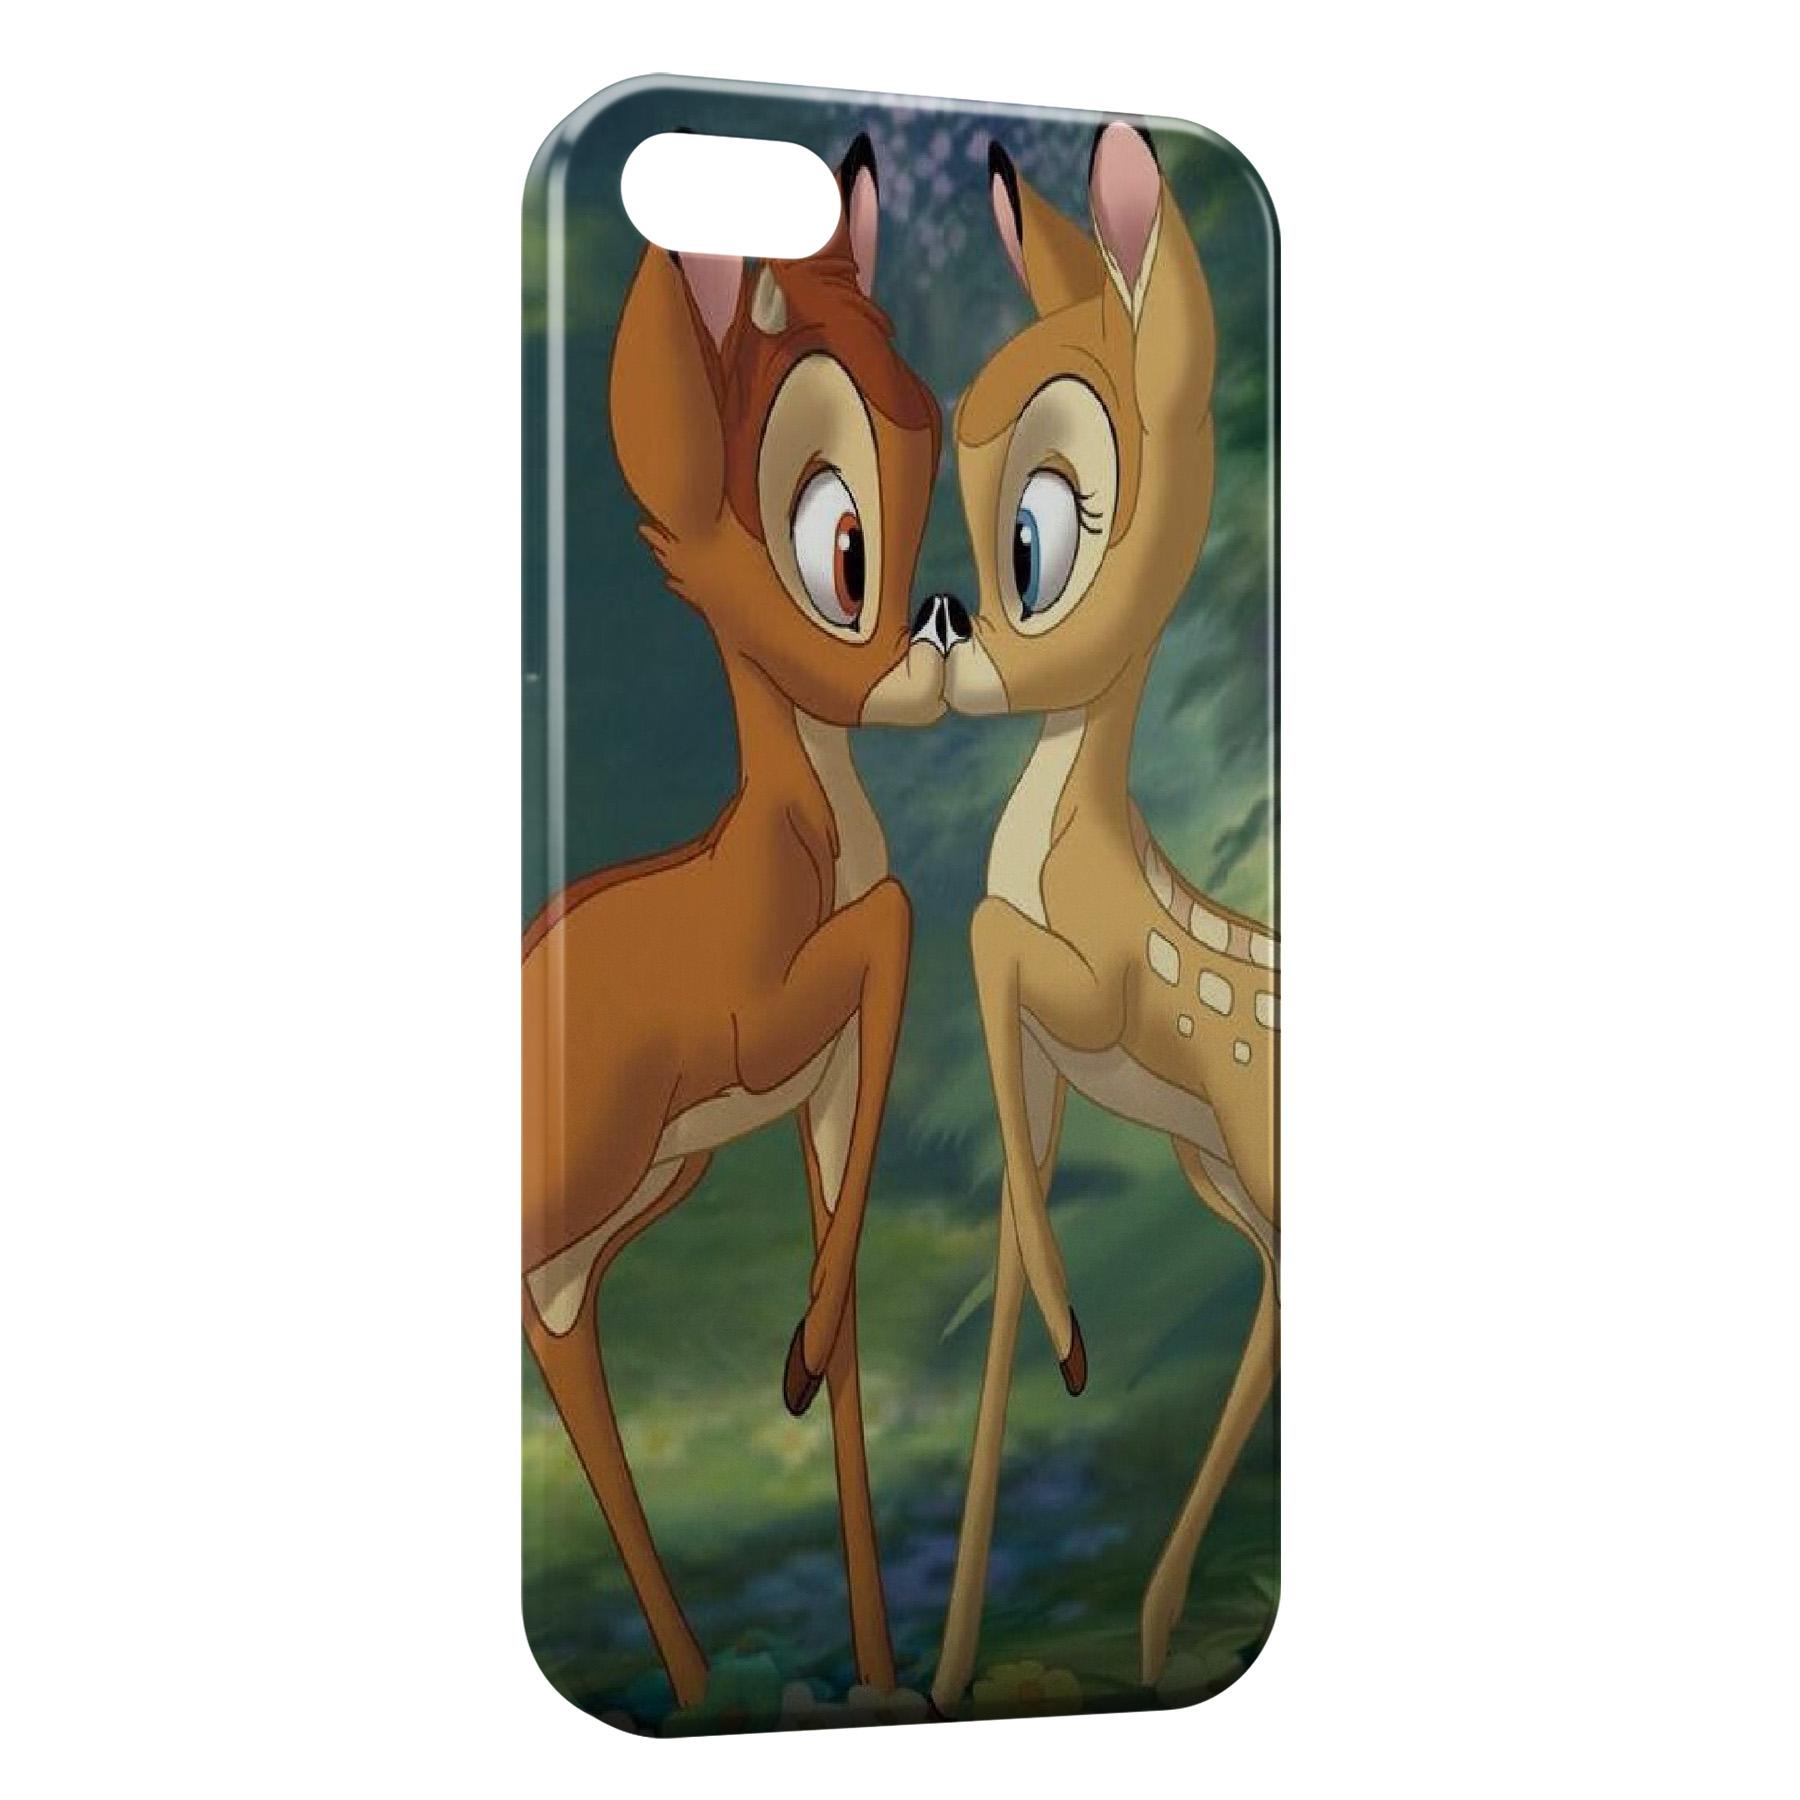 Coque iPhone 5/5S/SE Bambi Love 2